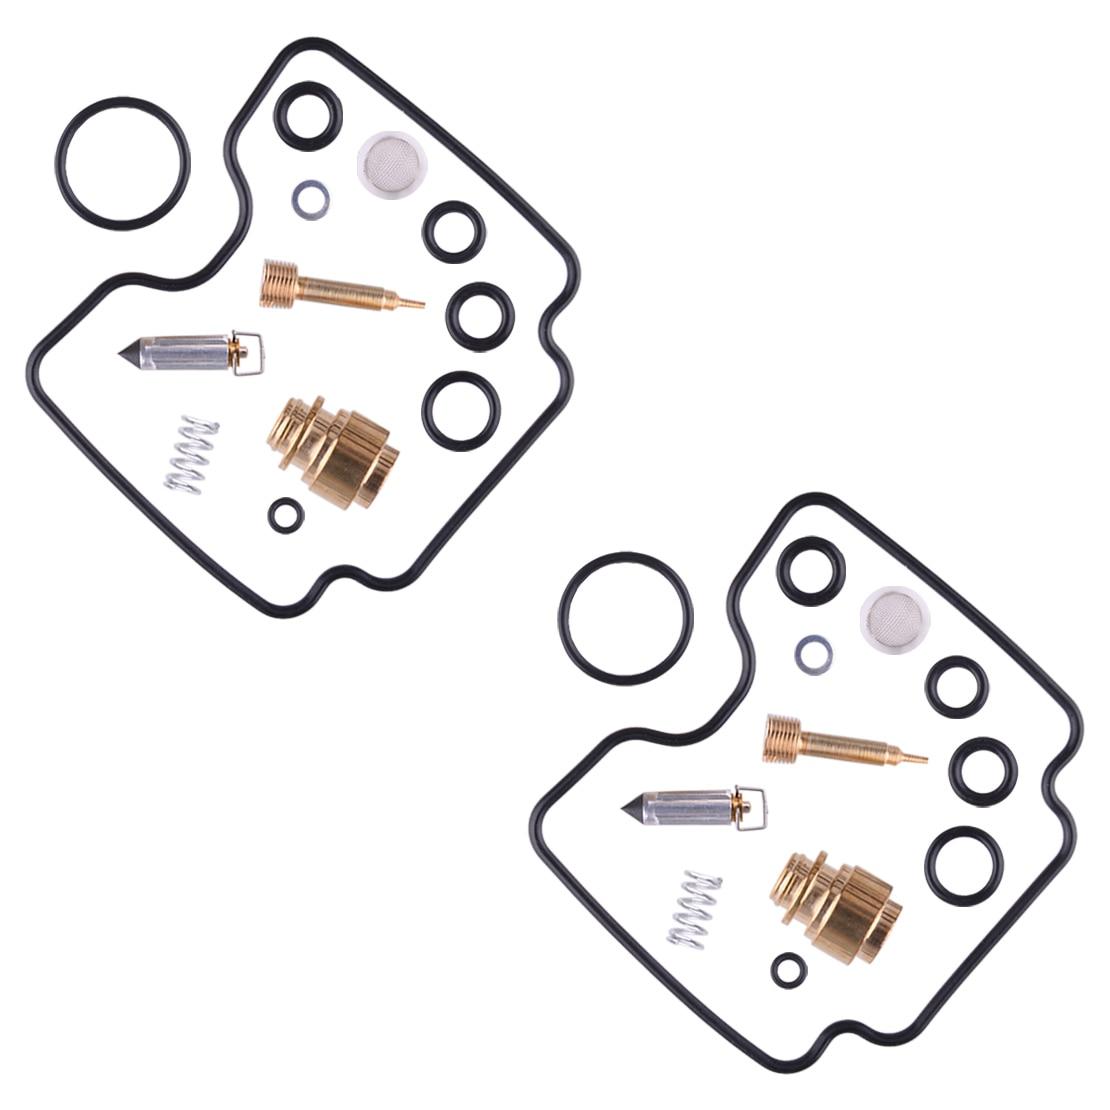 beler-2sets-carburetor-carb-repair-kits-fit-for-yamaha-v-star-1100-xvs1100-1999-2000-2001-2002-2003-2004-2005